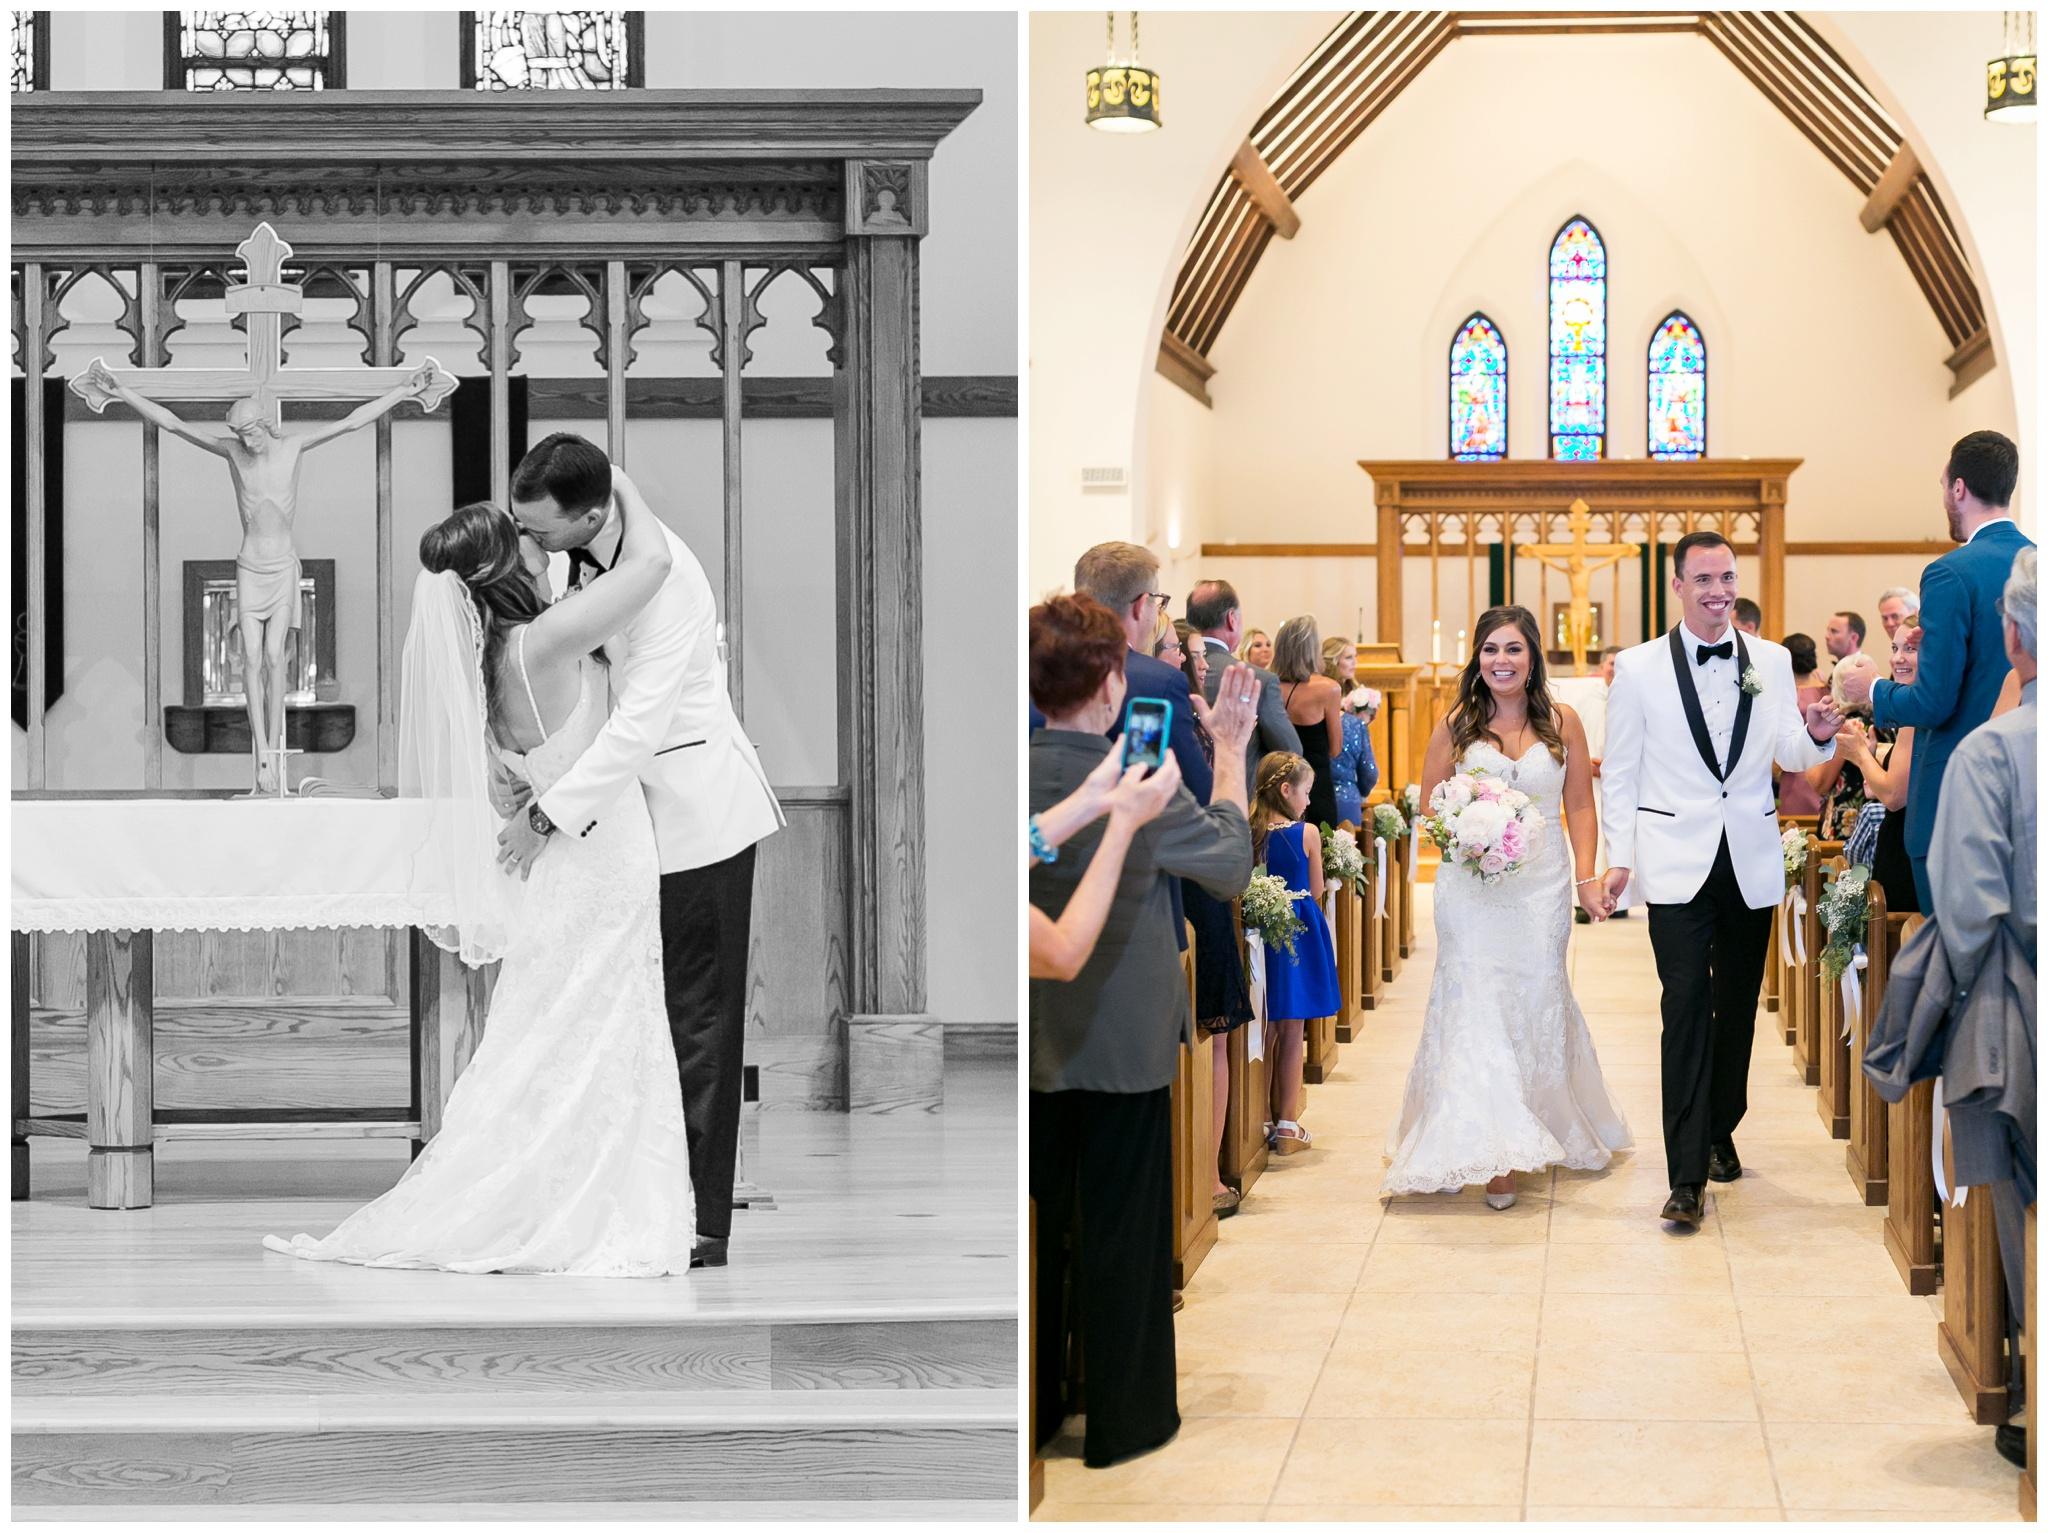 UW_Memorial_Union_wedding_madison_wisconsin_wedding_photographers_4611.jpg